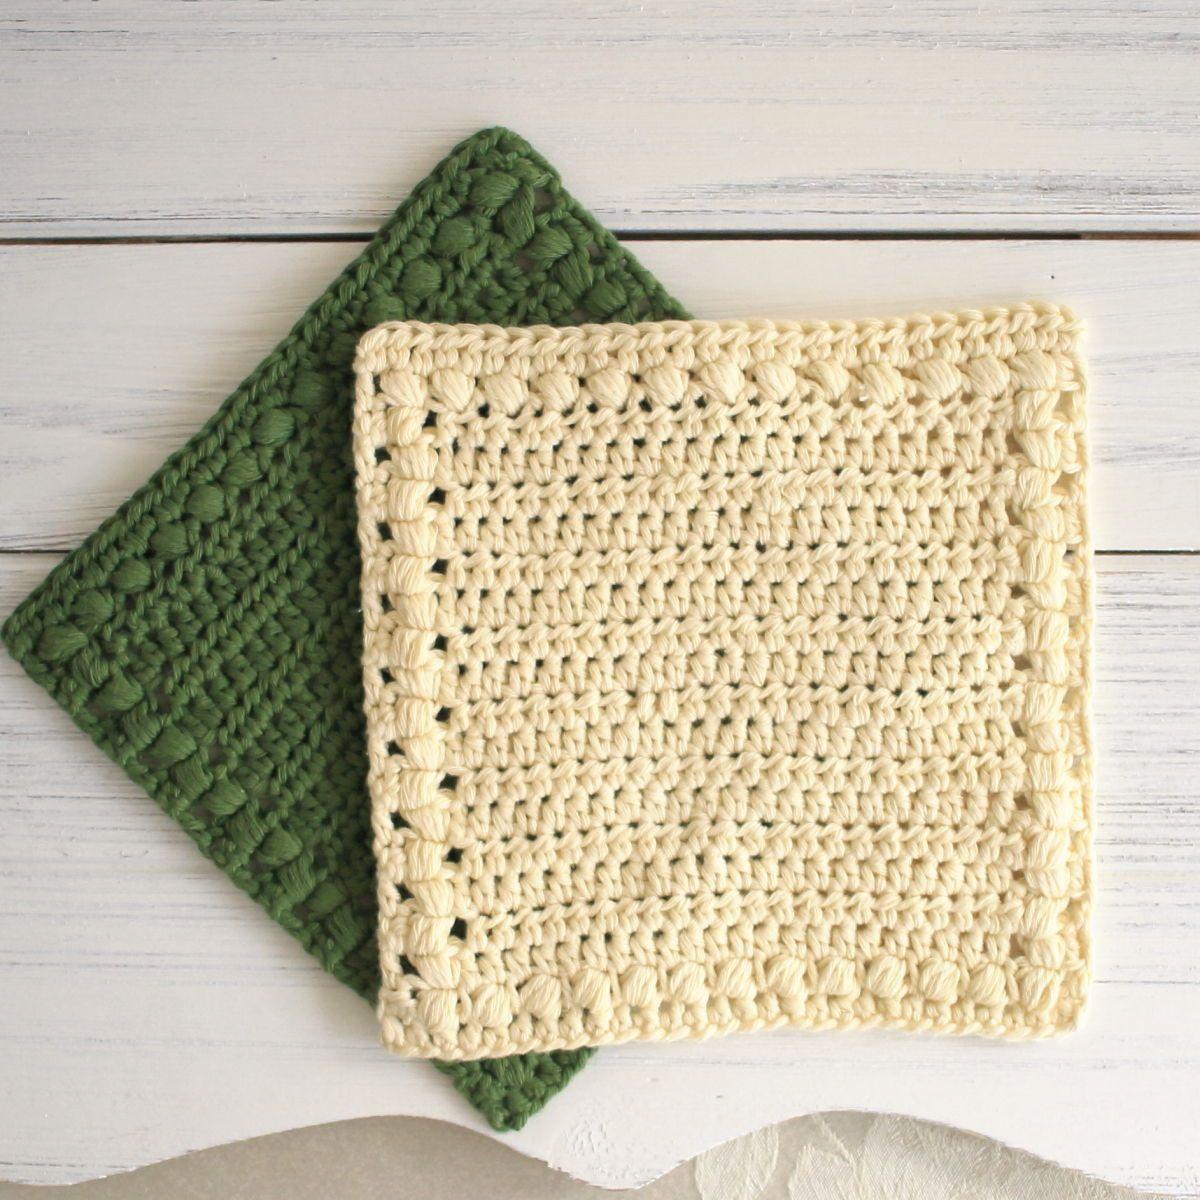 Green and cream washcloth